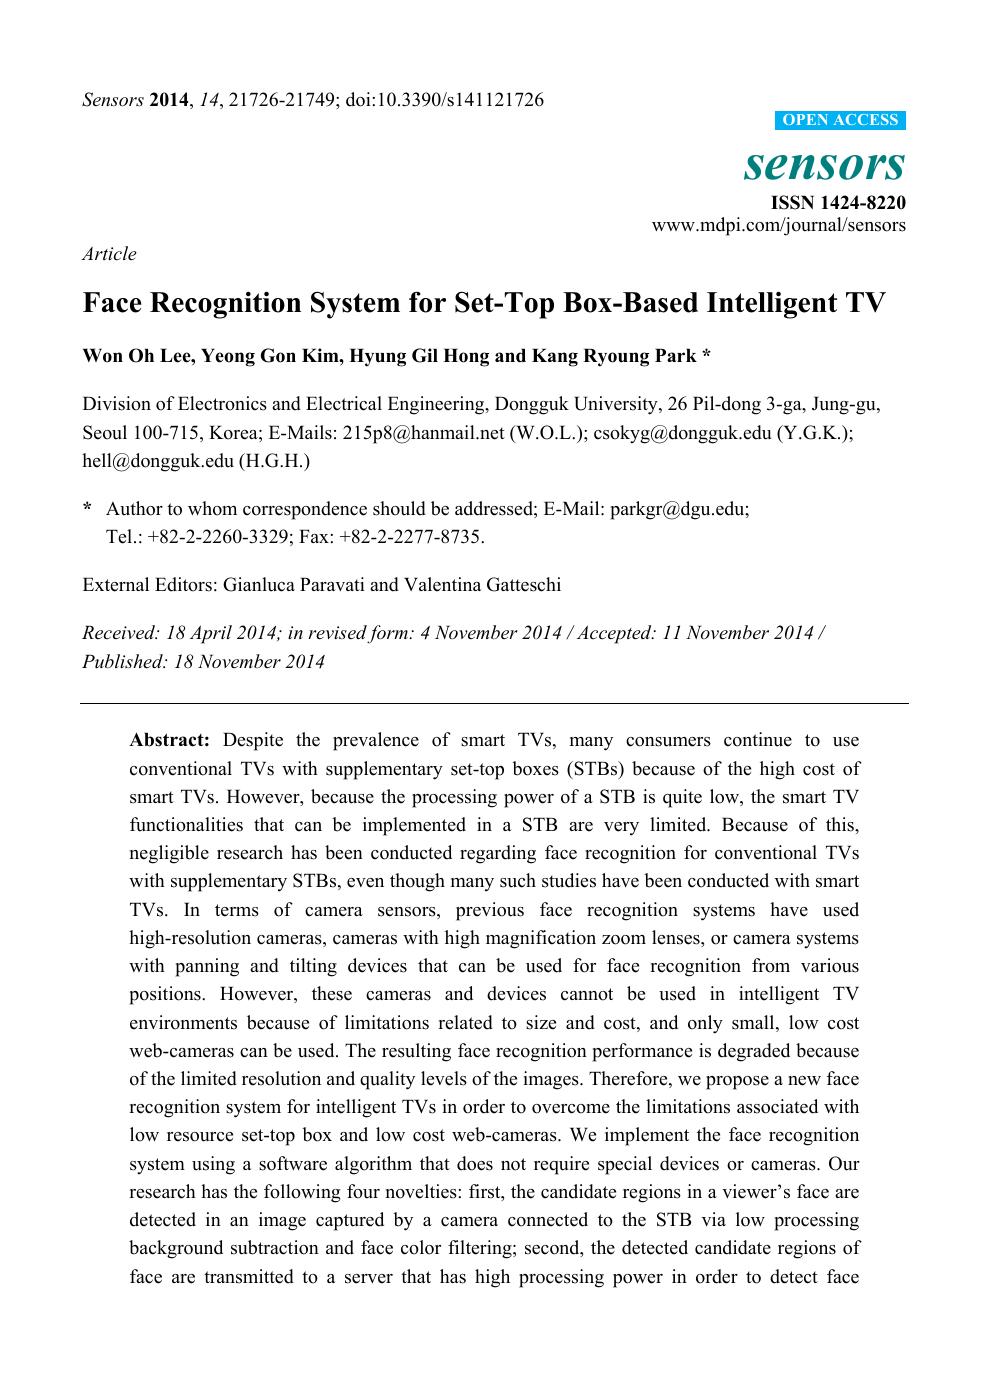 Face Recognition System for Set-Top Box-Based Intelligent TV